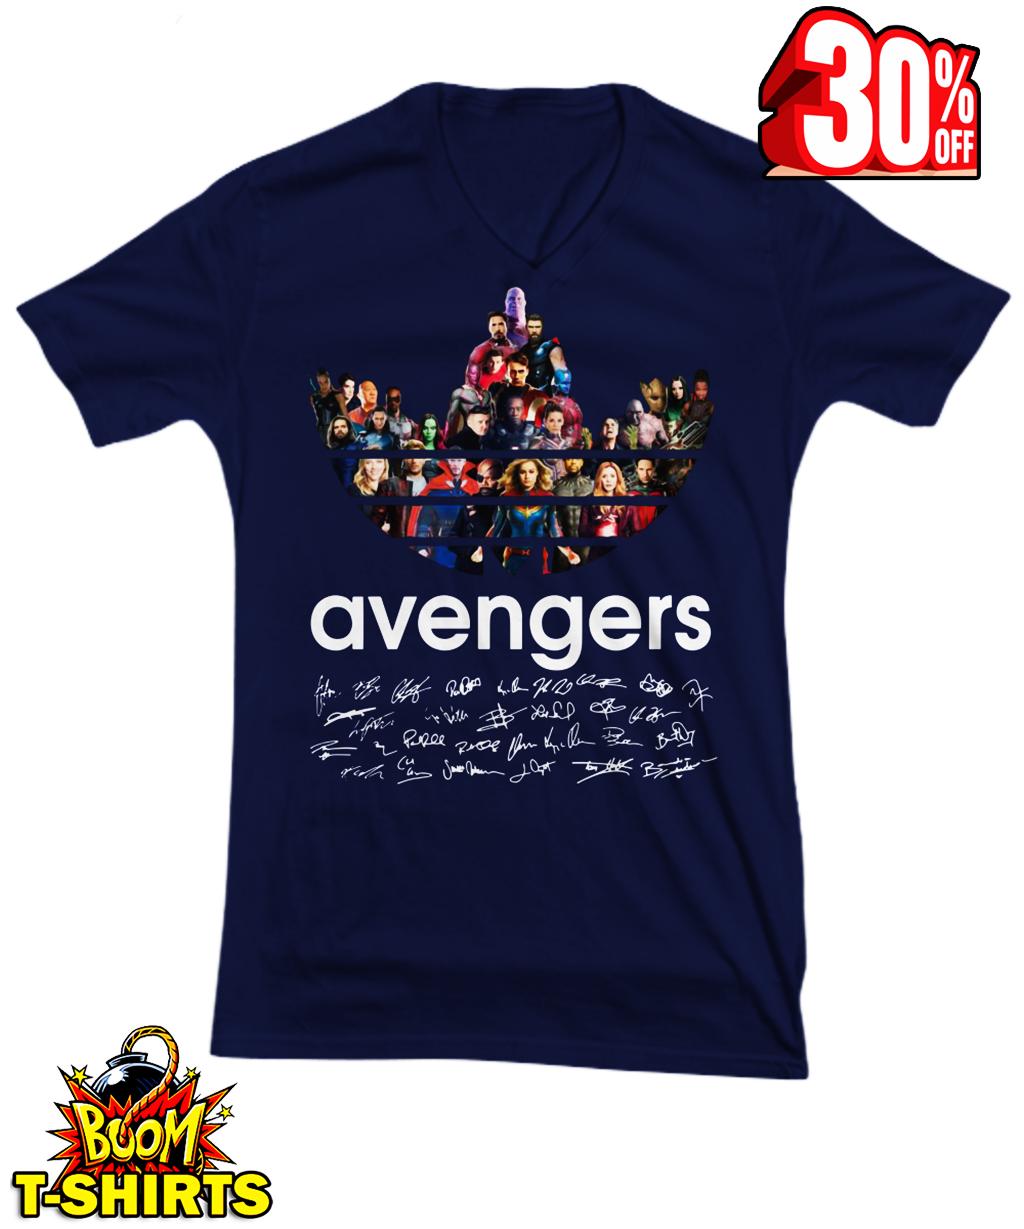 Adidas Avengers Signatures v-neck tee